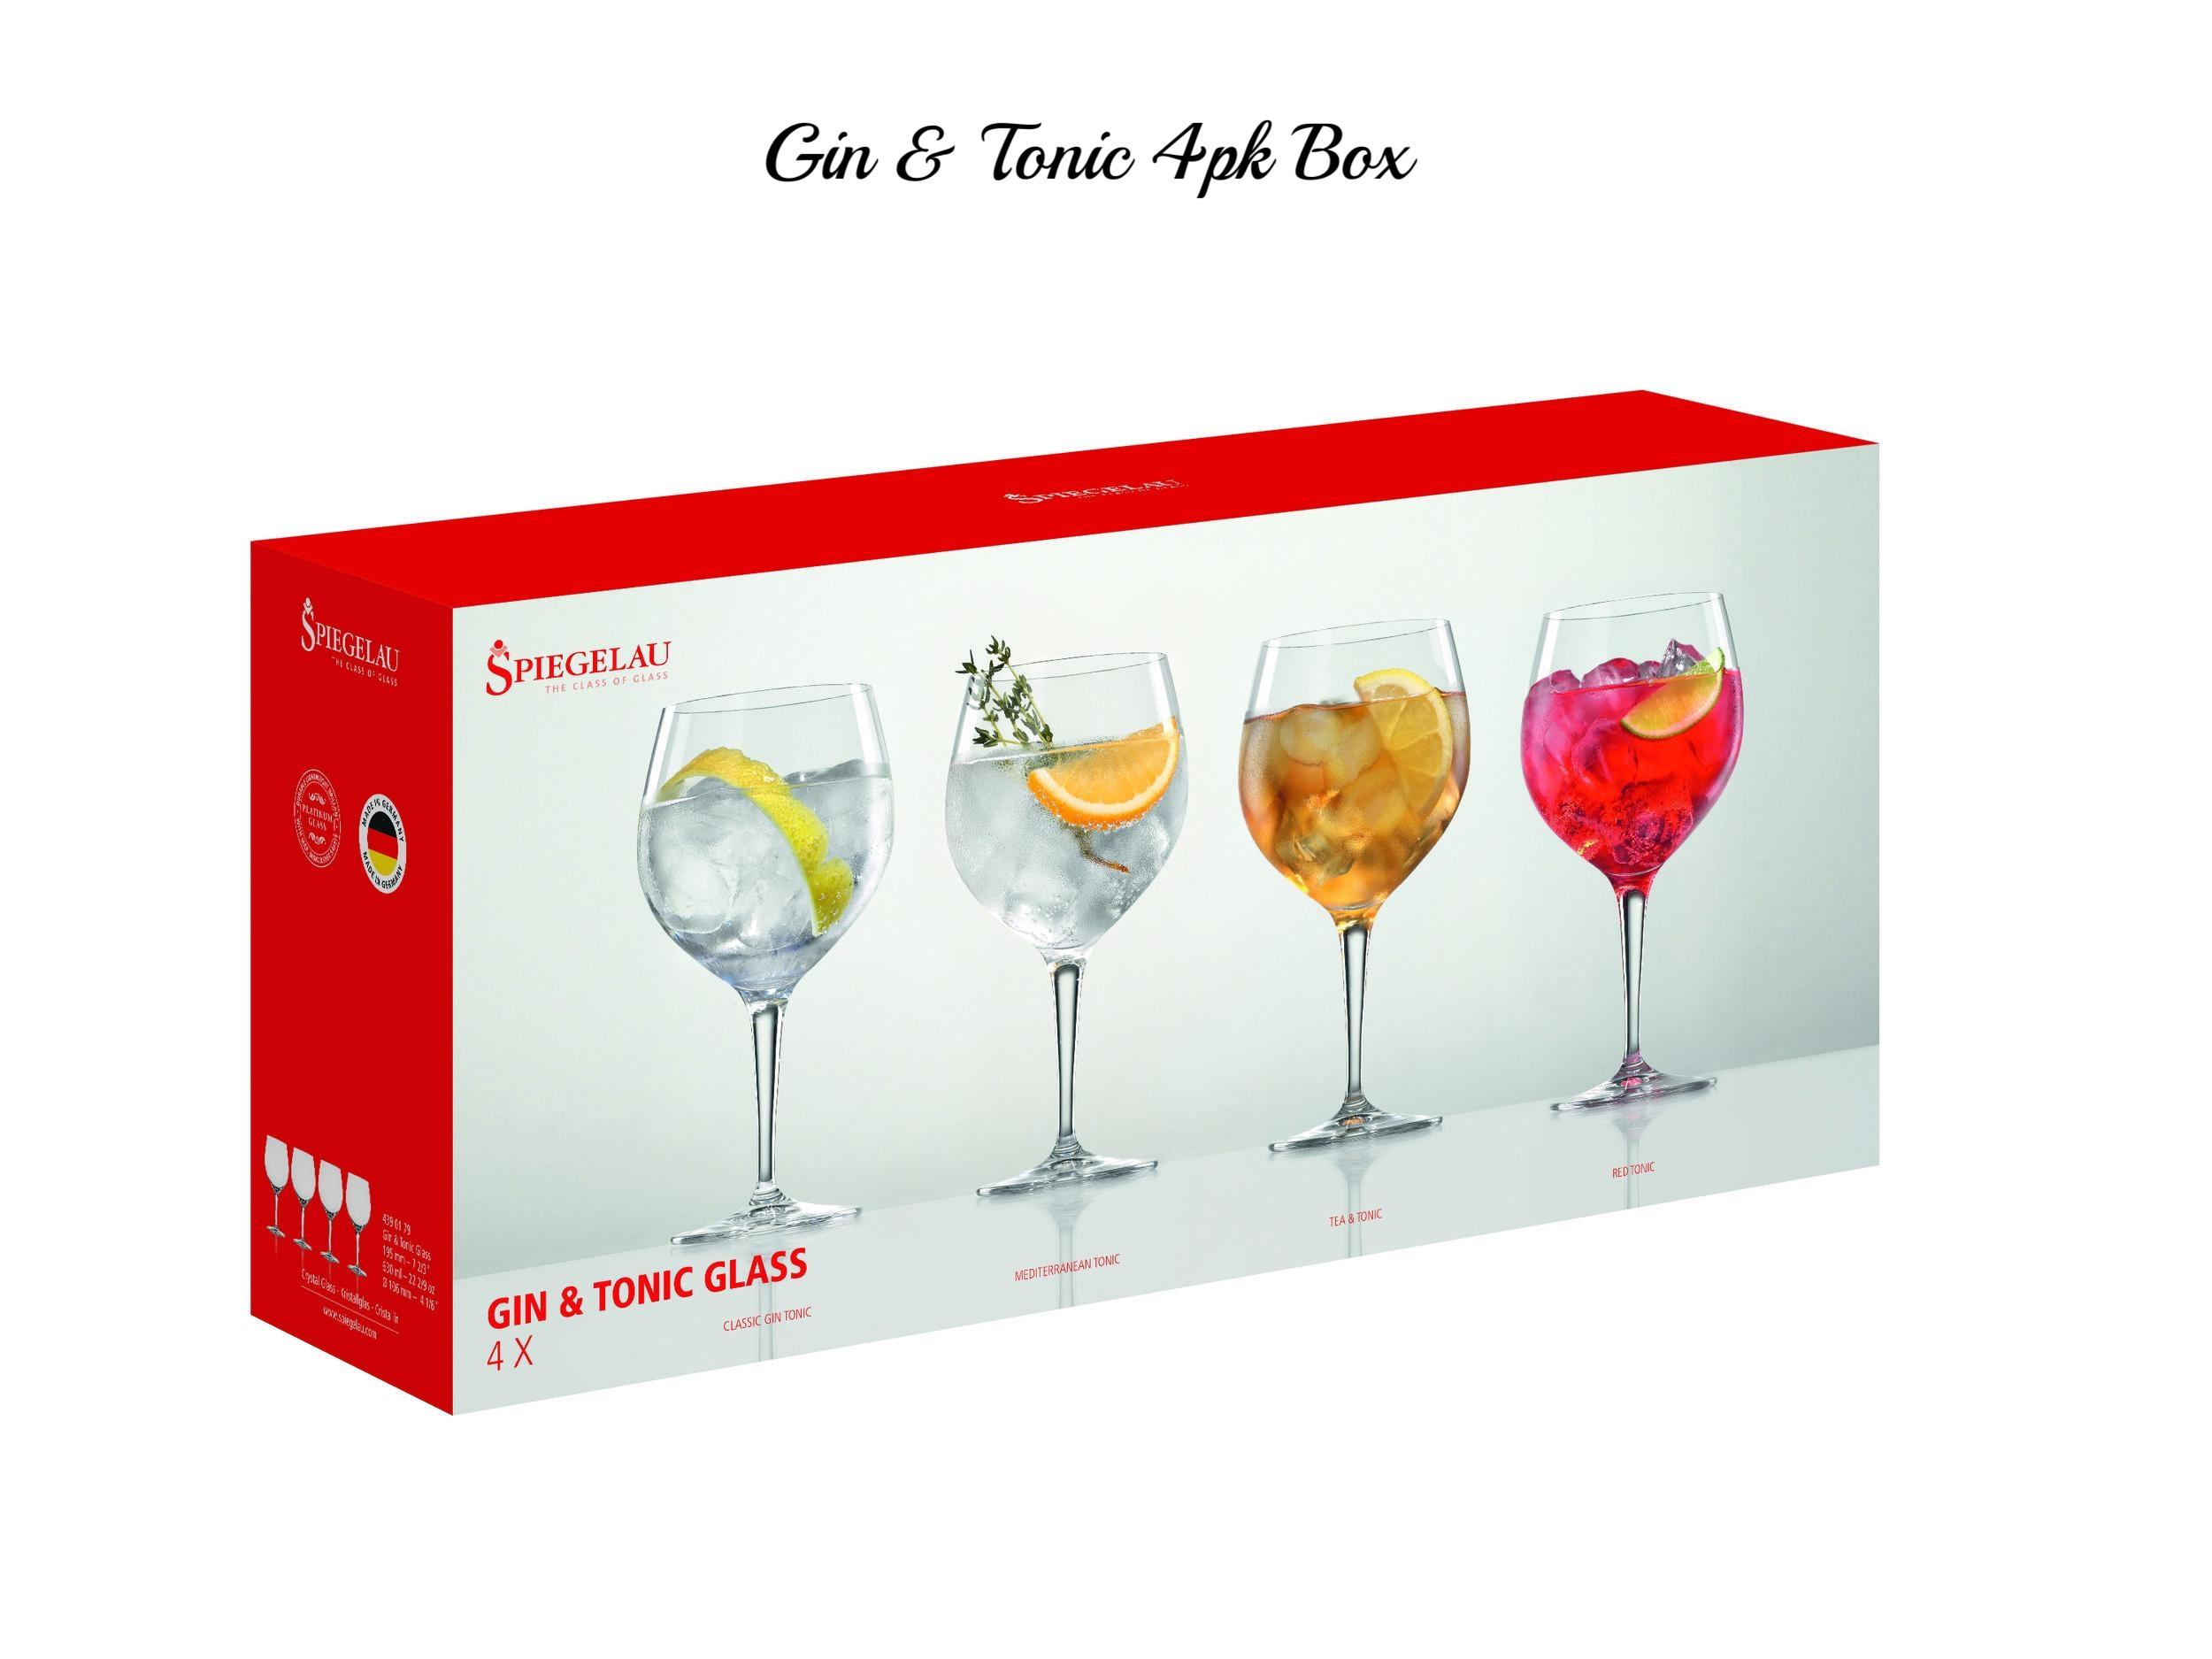 BOX_PU4_GinTonicGlass_4390179_10_15.jpg